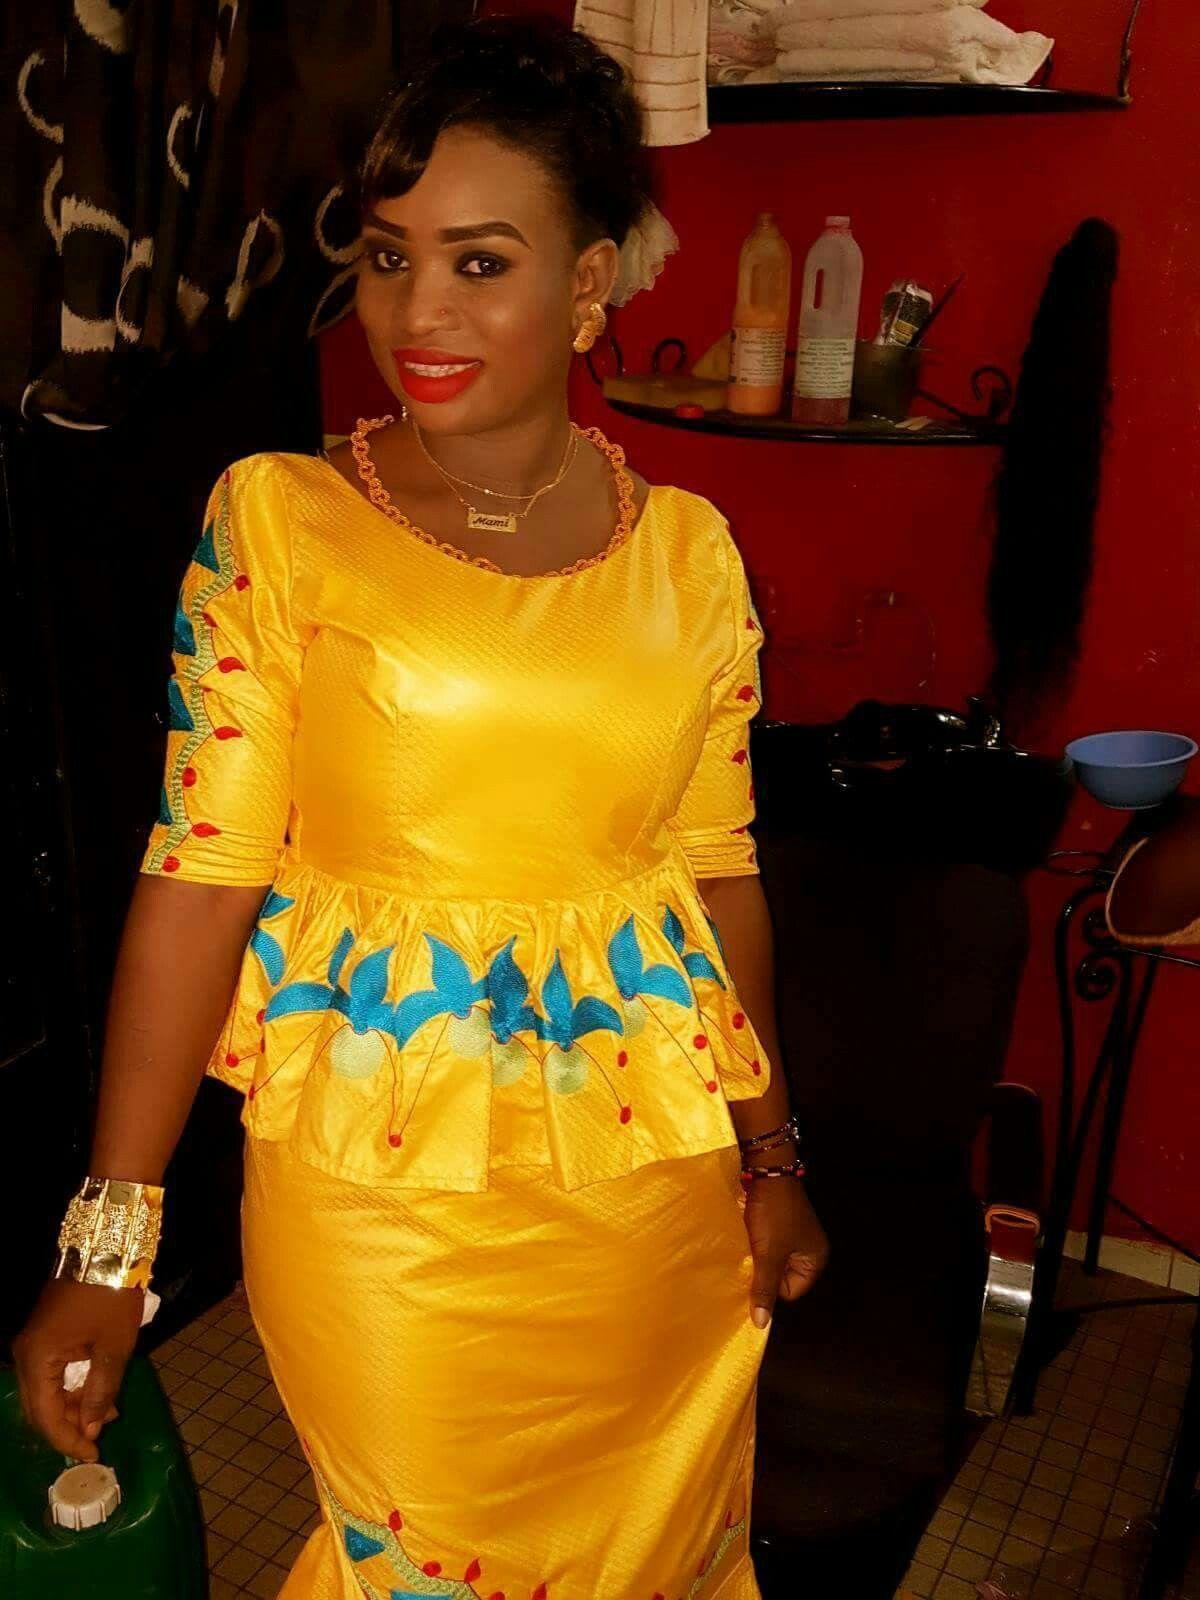 malian fashion bazin malifashion bazin malianwomenarebeautiful mode africaine pinterest. Black Bedroom Furniture Sets. Home Design Ideas